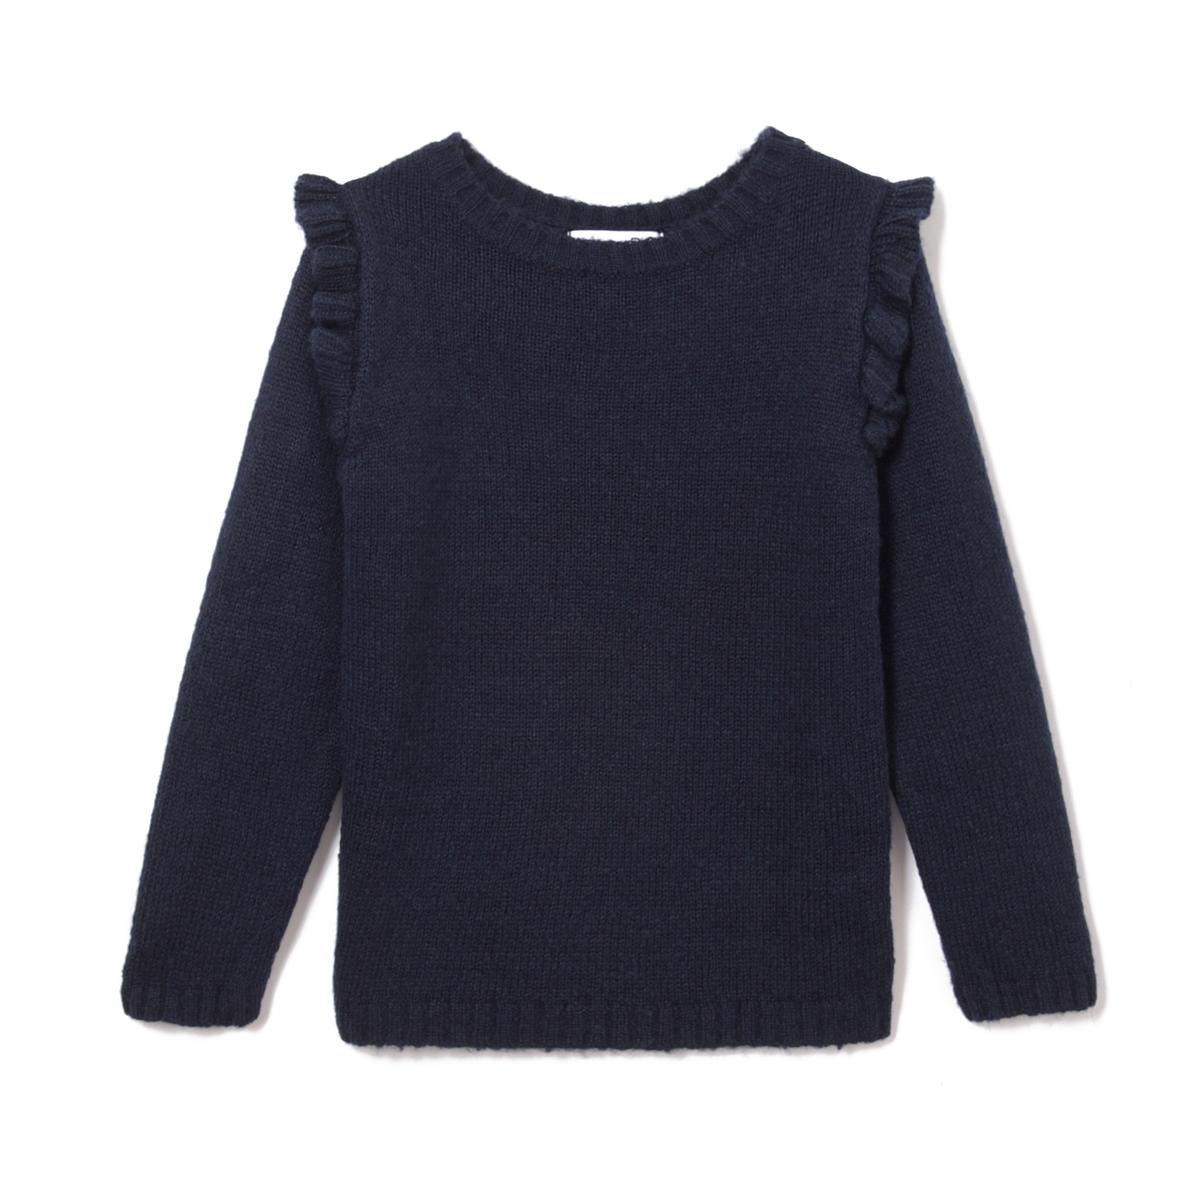 Пуловер с воланами, 3-12 лет пуловер quelle b c best connections 40703 page 3